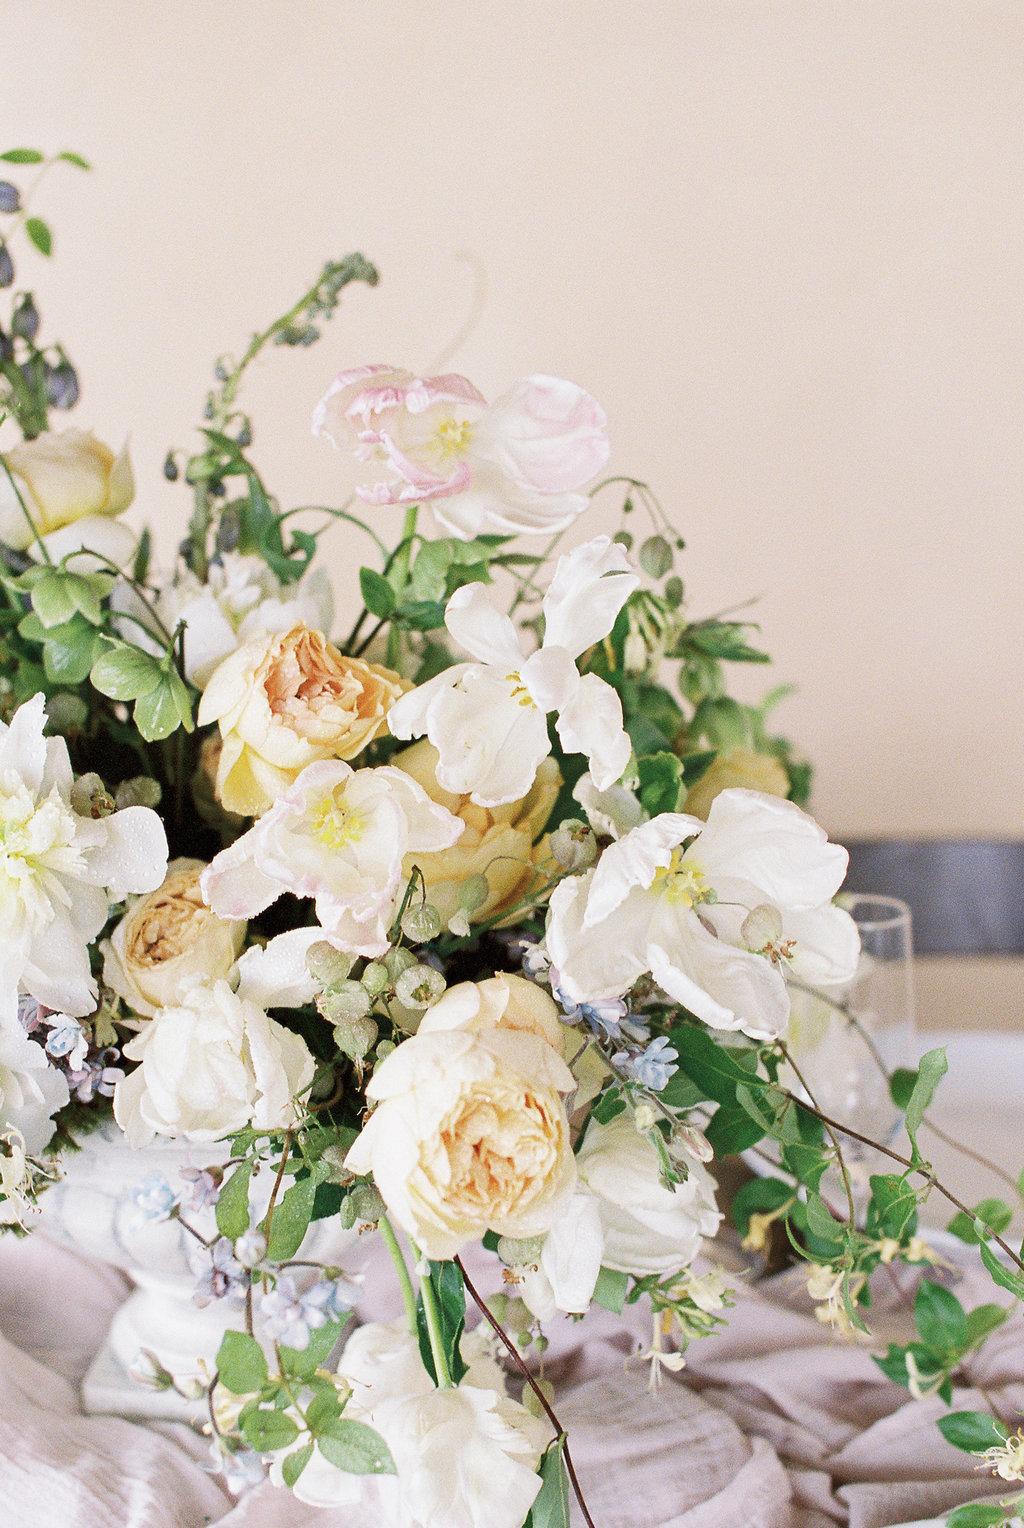 Montaluce-winery-dahlonega-headshots-hannah-forsberg-atlanta-wedding-photographer-22.jpg